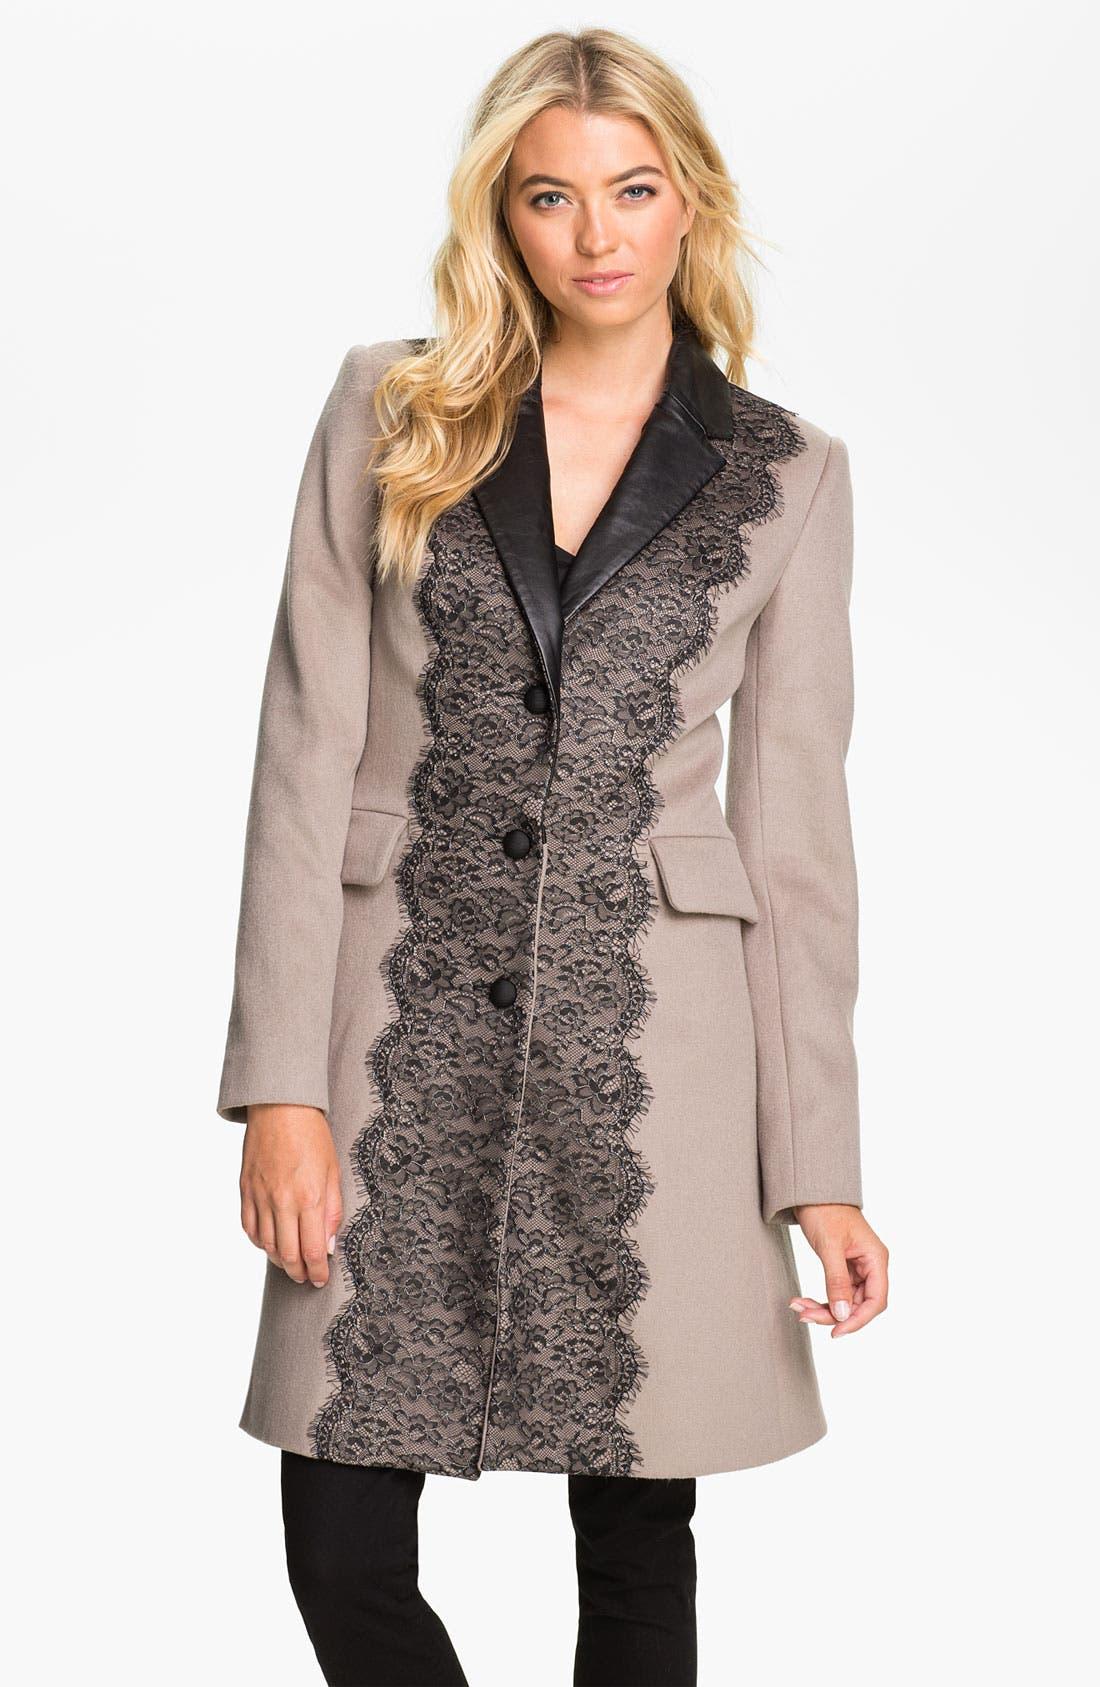 Alternate Image 1 Selected - Badgley Mischka 'Madeline' Coat